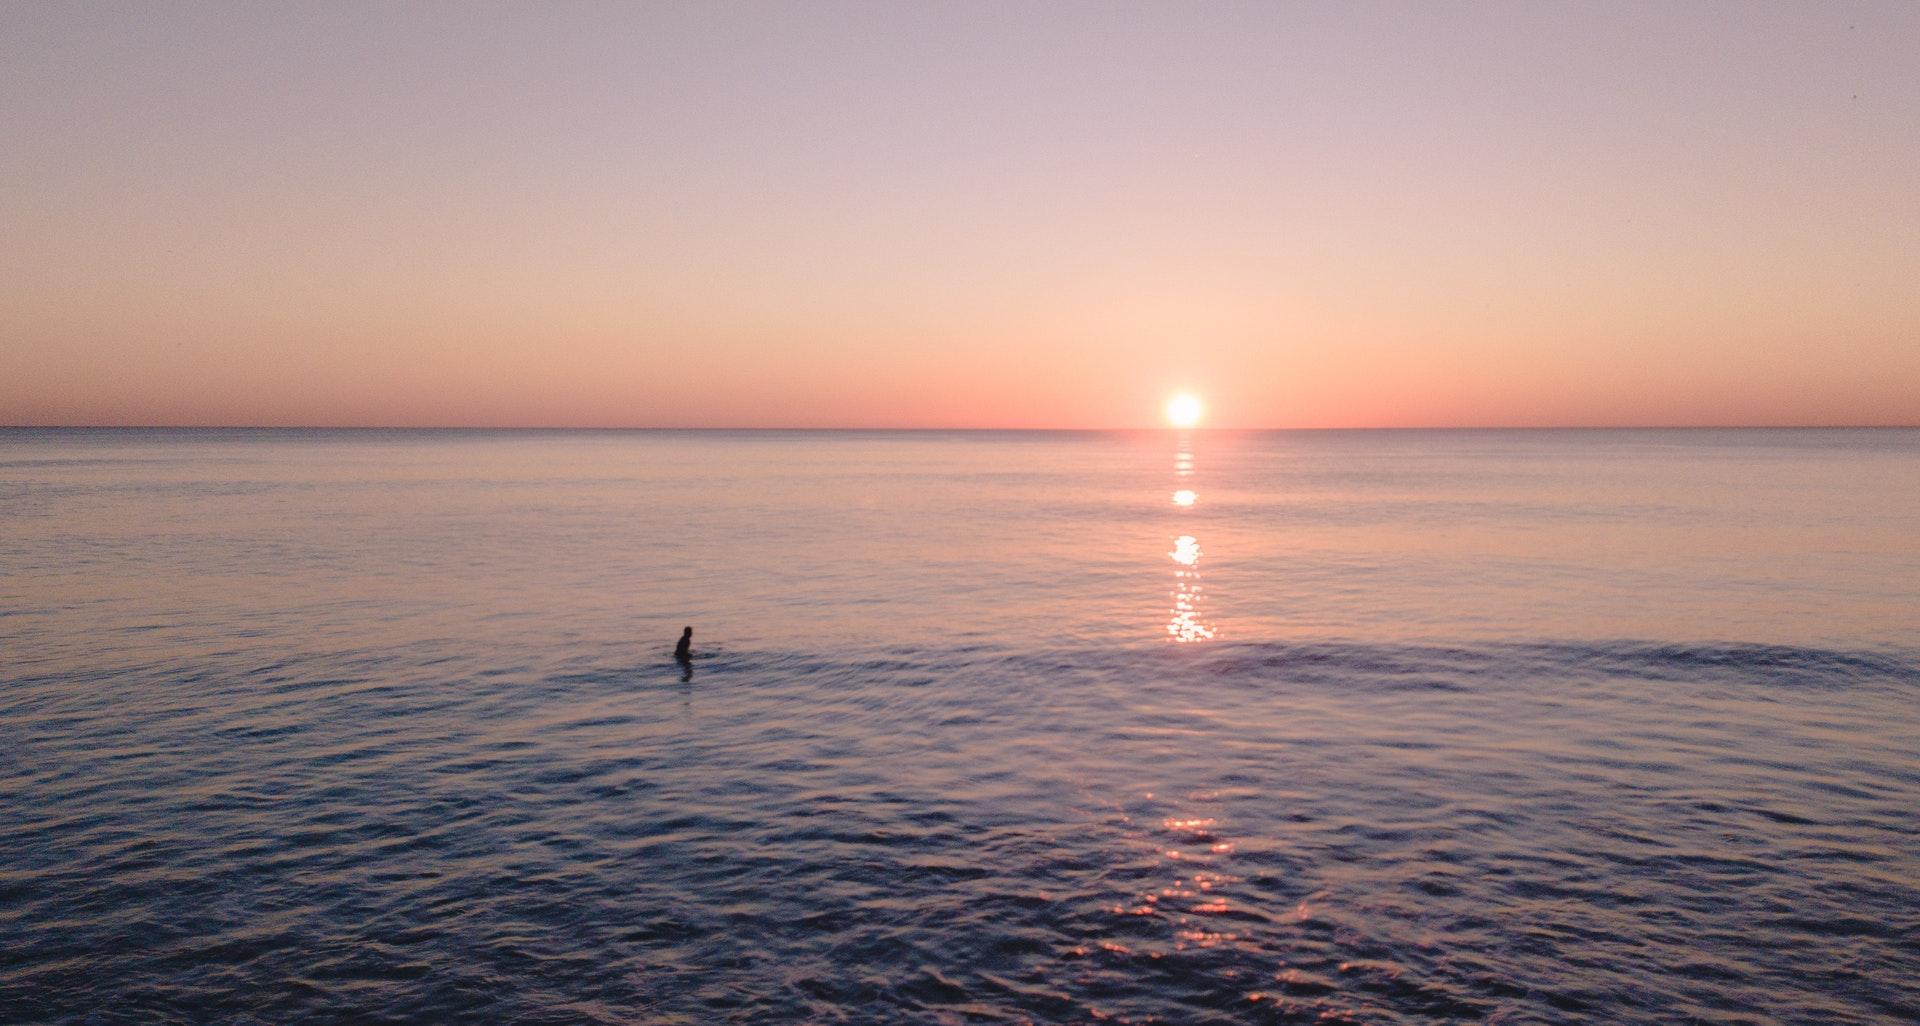 PhotoFly Travel Club | ocean-during-golden-hour-1751130 | PhotoFly Travel Club